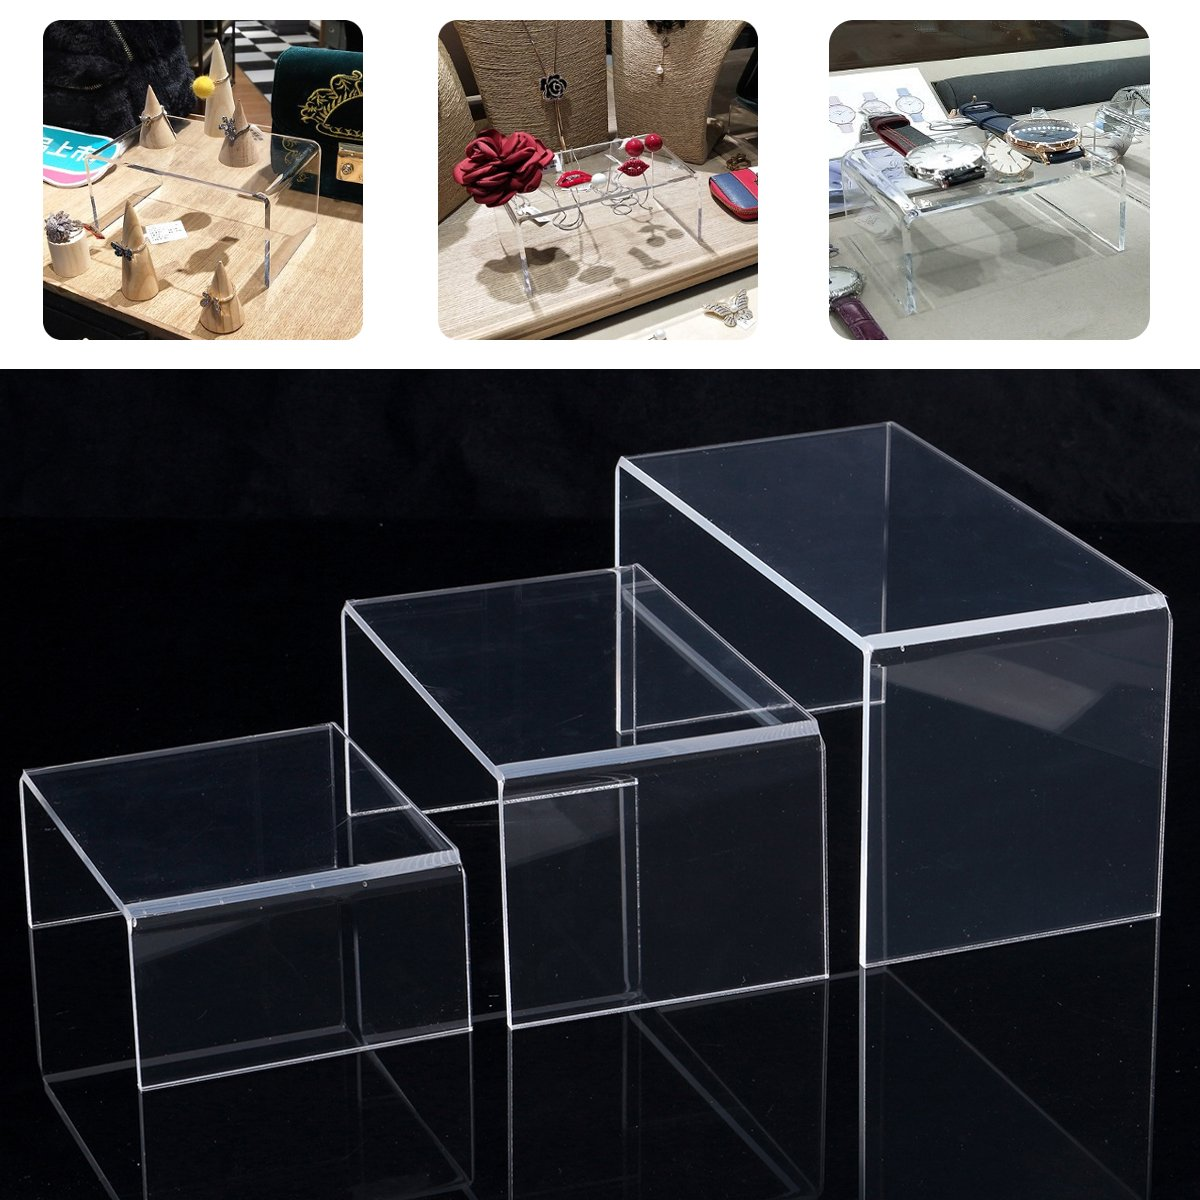 3pcs Acrylic Riser Display Shelf Removable Rack Display Stand for Figures